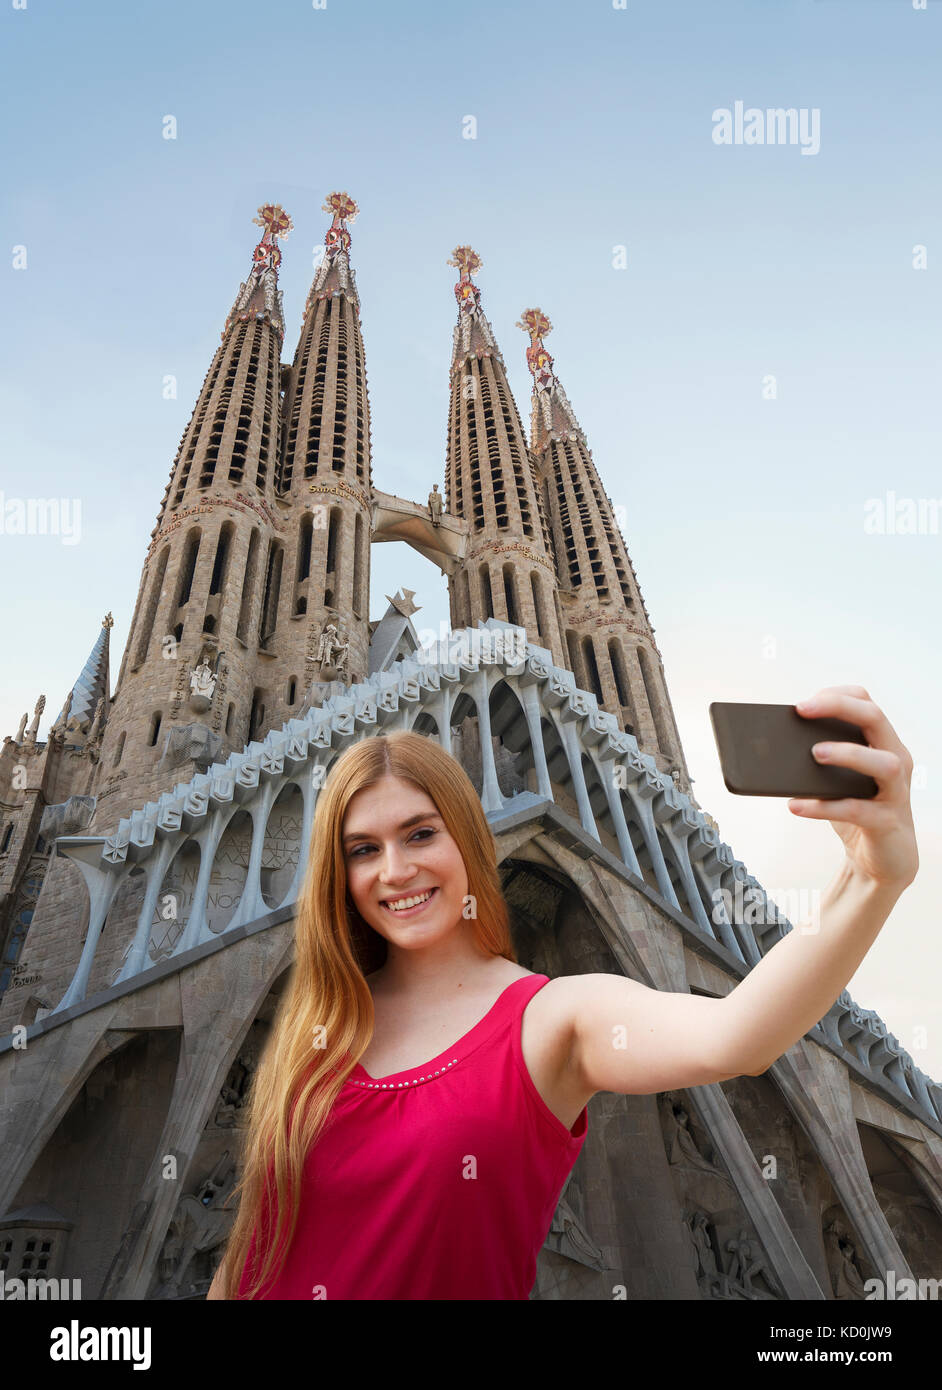 Frau unter selfie vor der Kathedrale Sagrada Familia, Barcelona, Katalonien, Spanien, Europa Stockbild